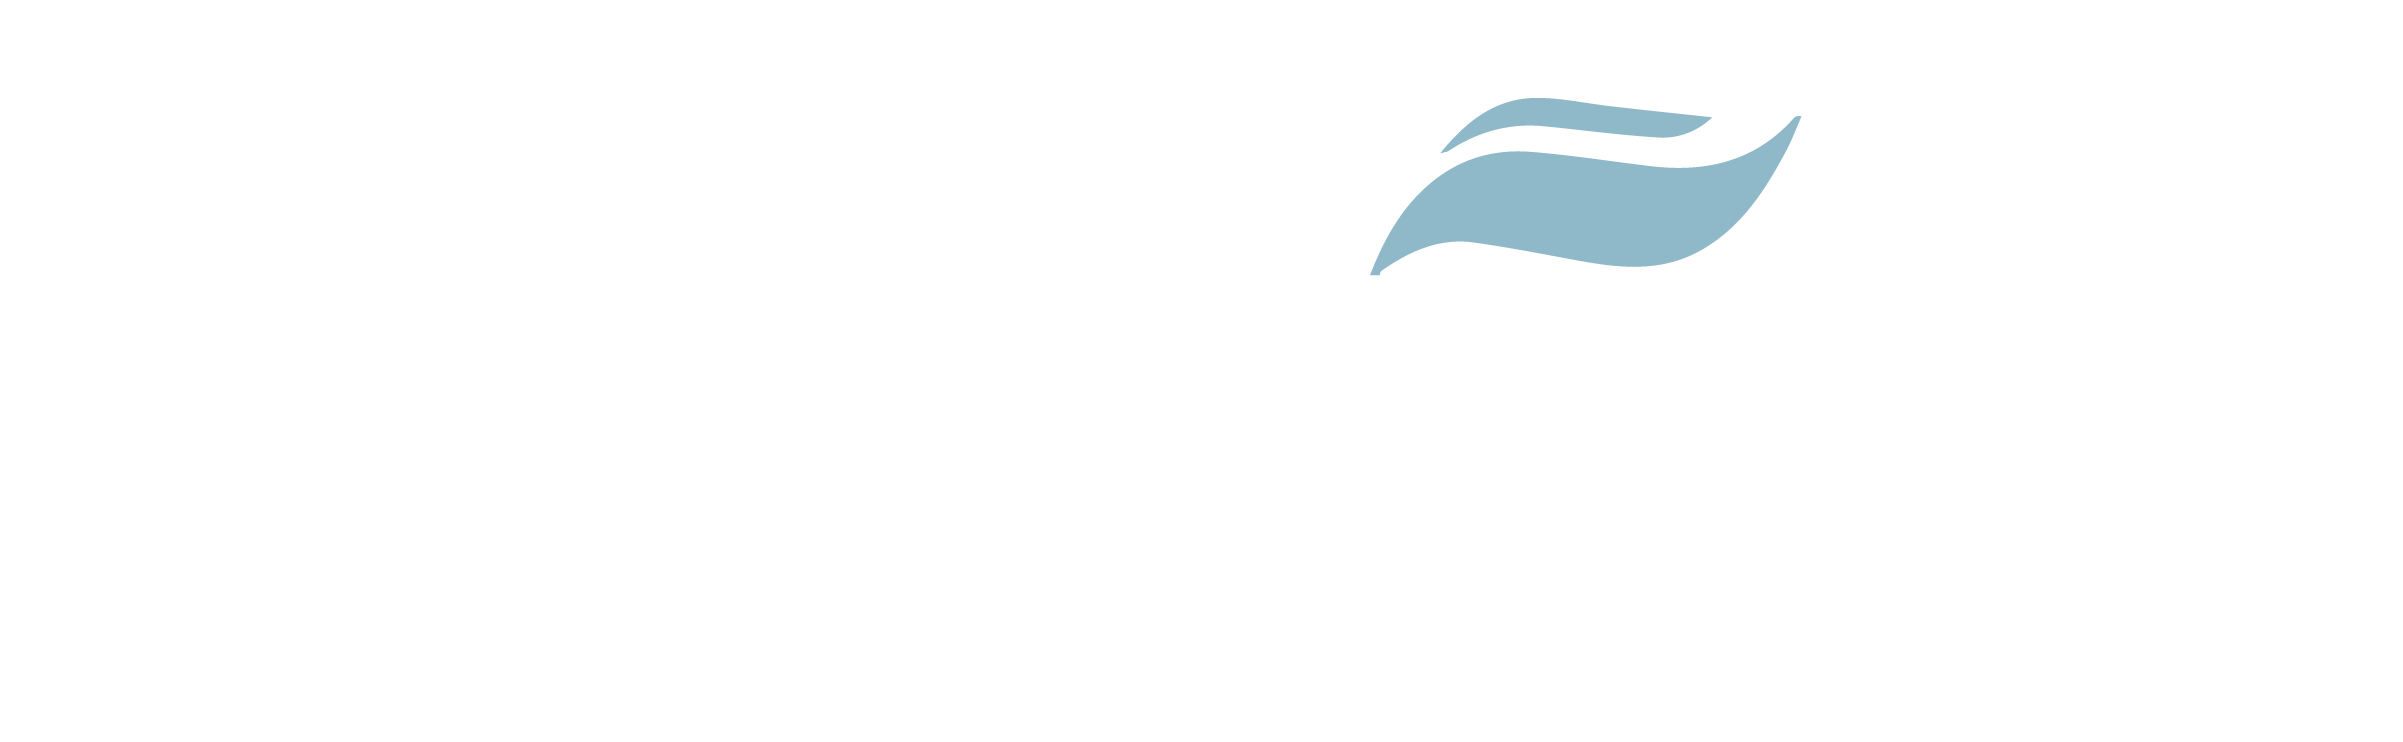 Asociación Peniel de Rehabilitación y Formación Social - APERFOSA